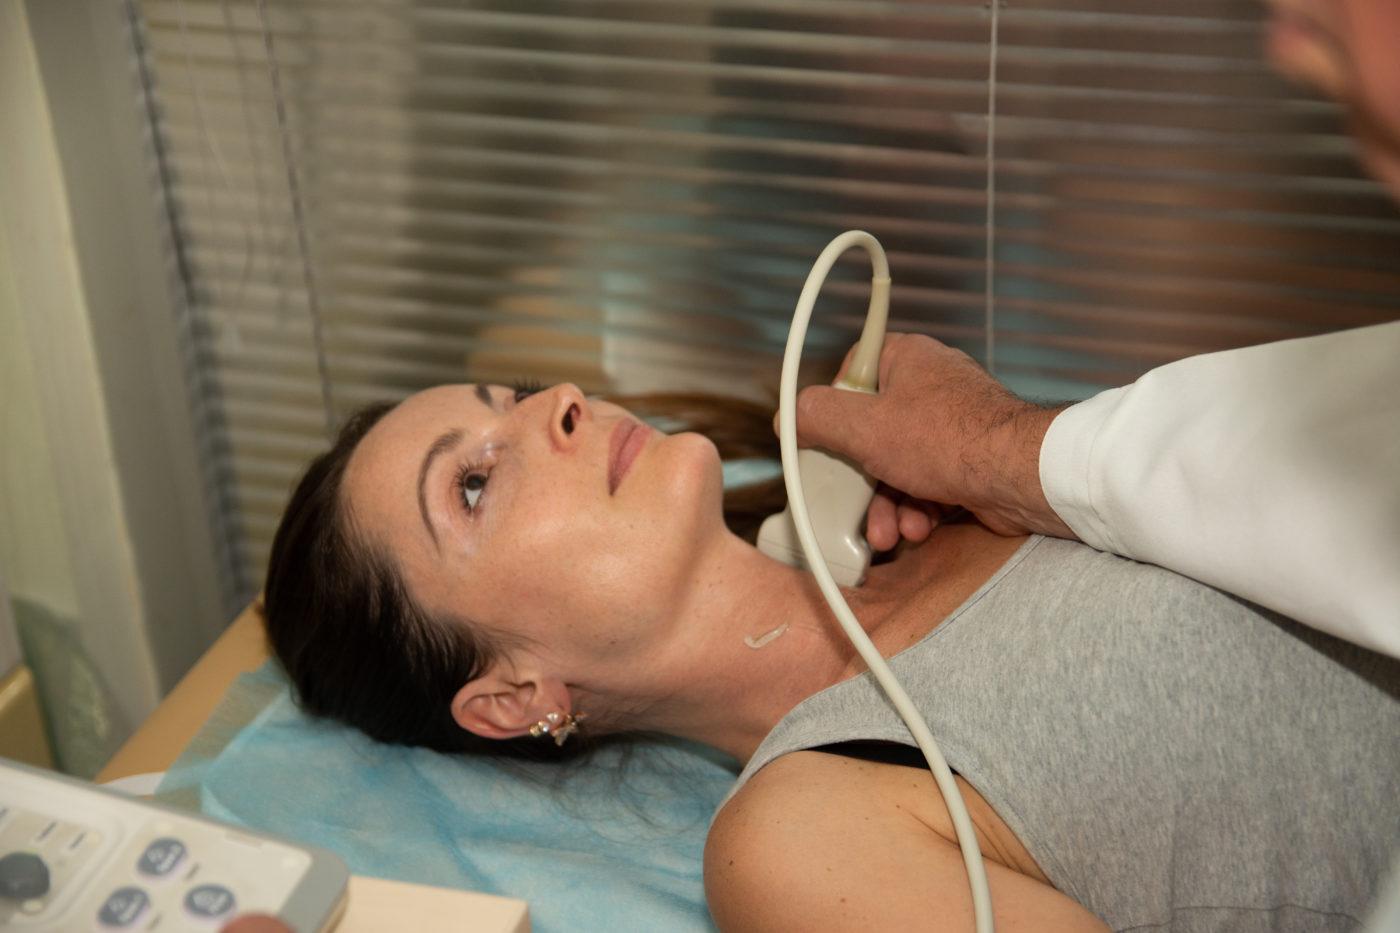 УЗД молочних залоз, УЗД судин, УЗД щитовидної залози судин